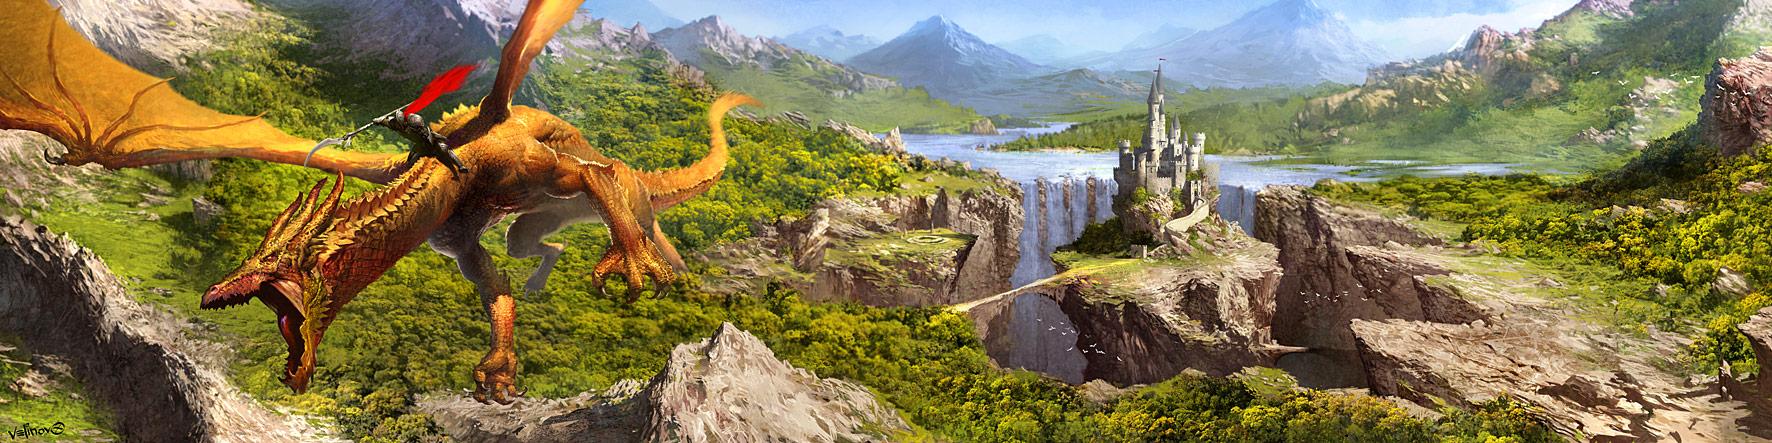 Dragonrider valley